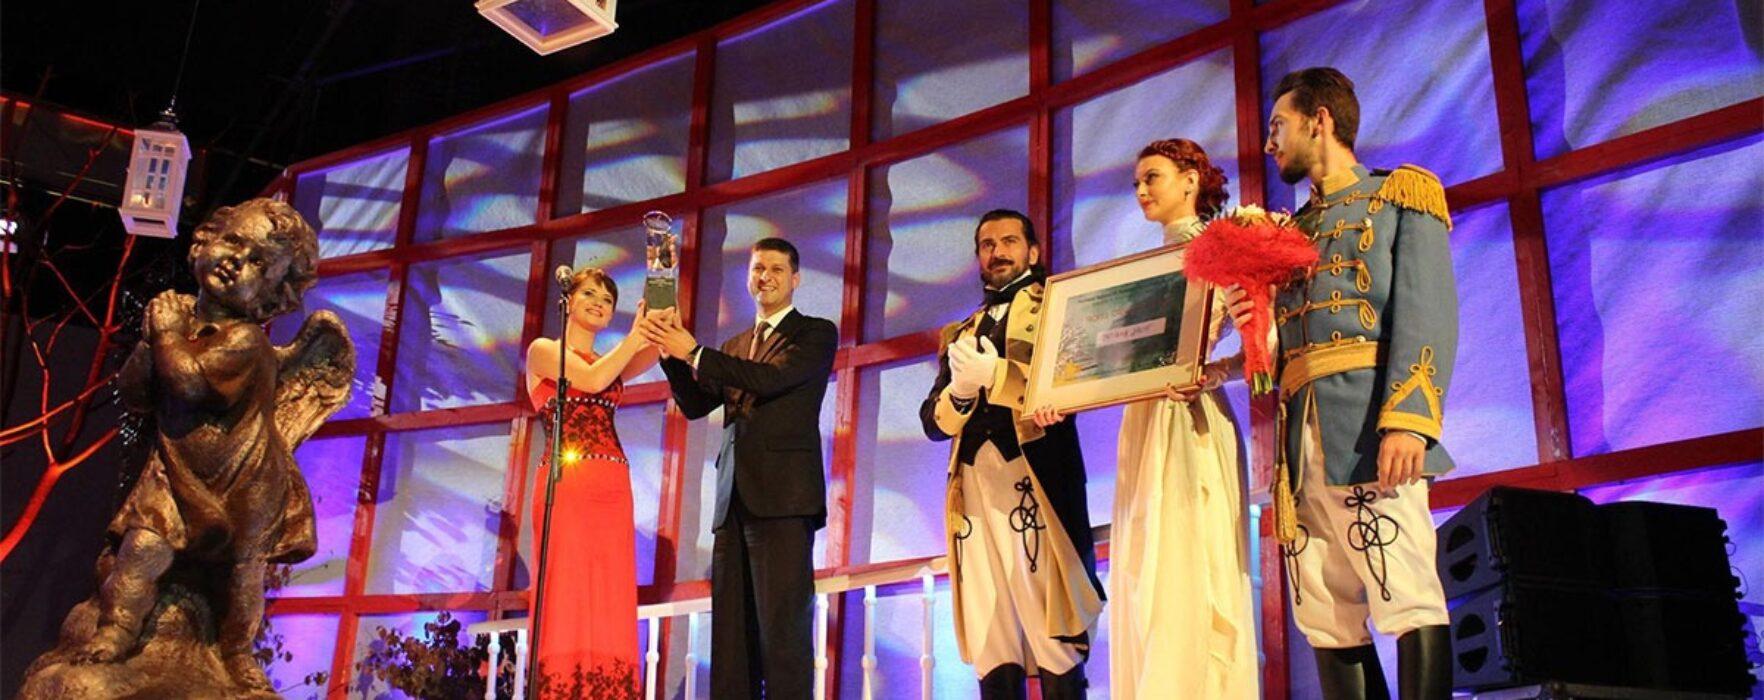 Tatiana Jacot a câştigat marele premiu la Crizantema de Aur